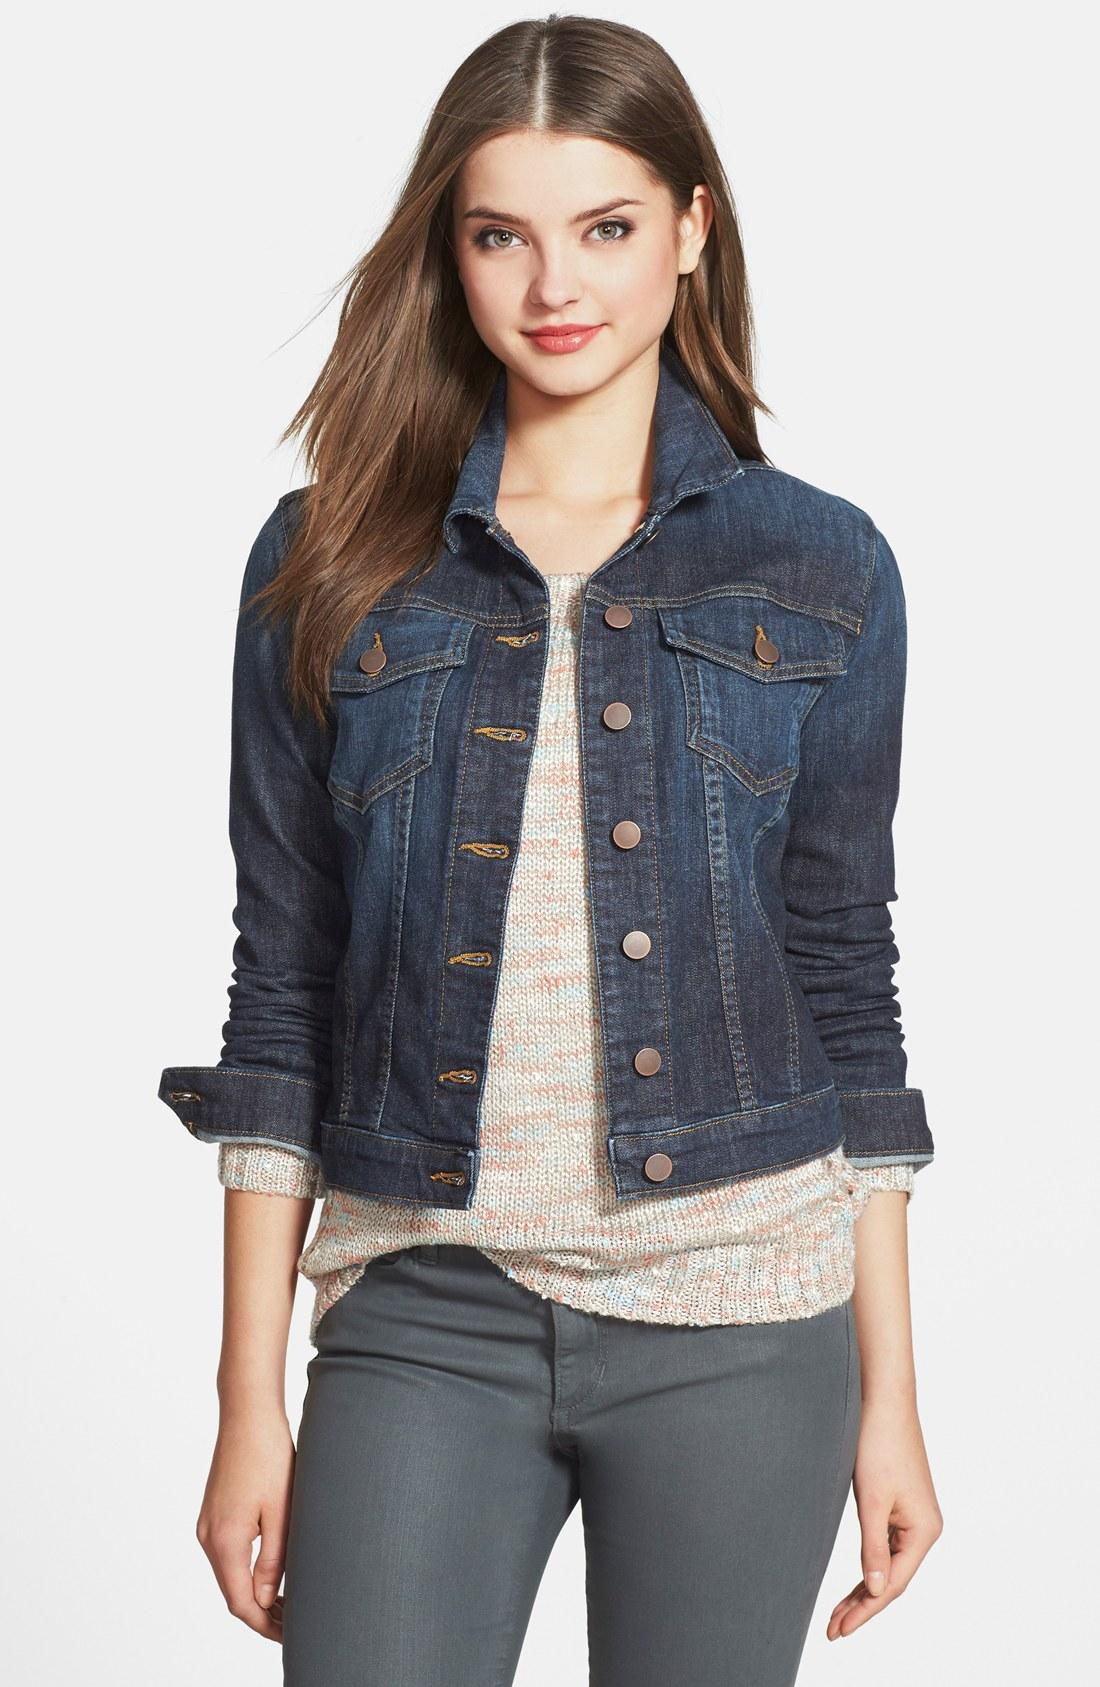 Classic spring summer staple: womens denim jacket